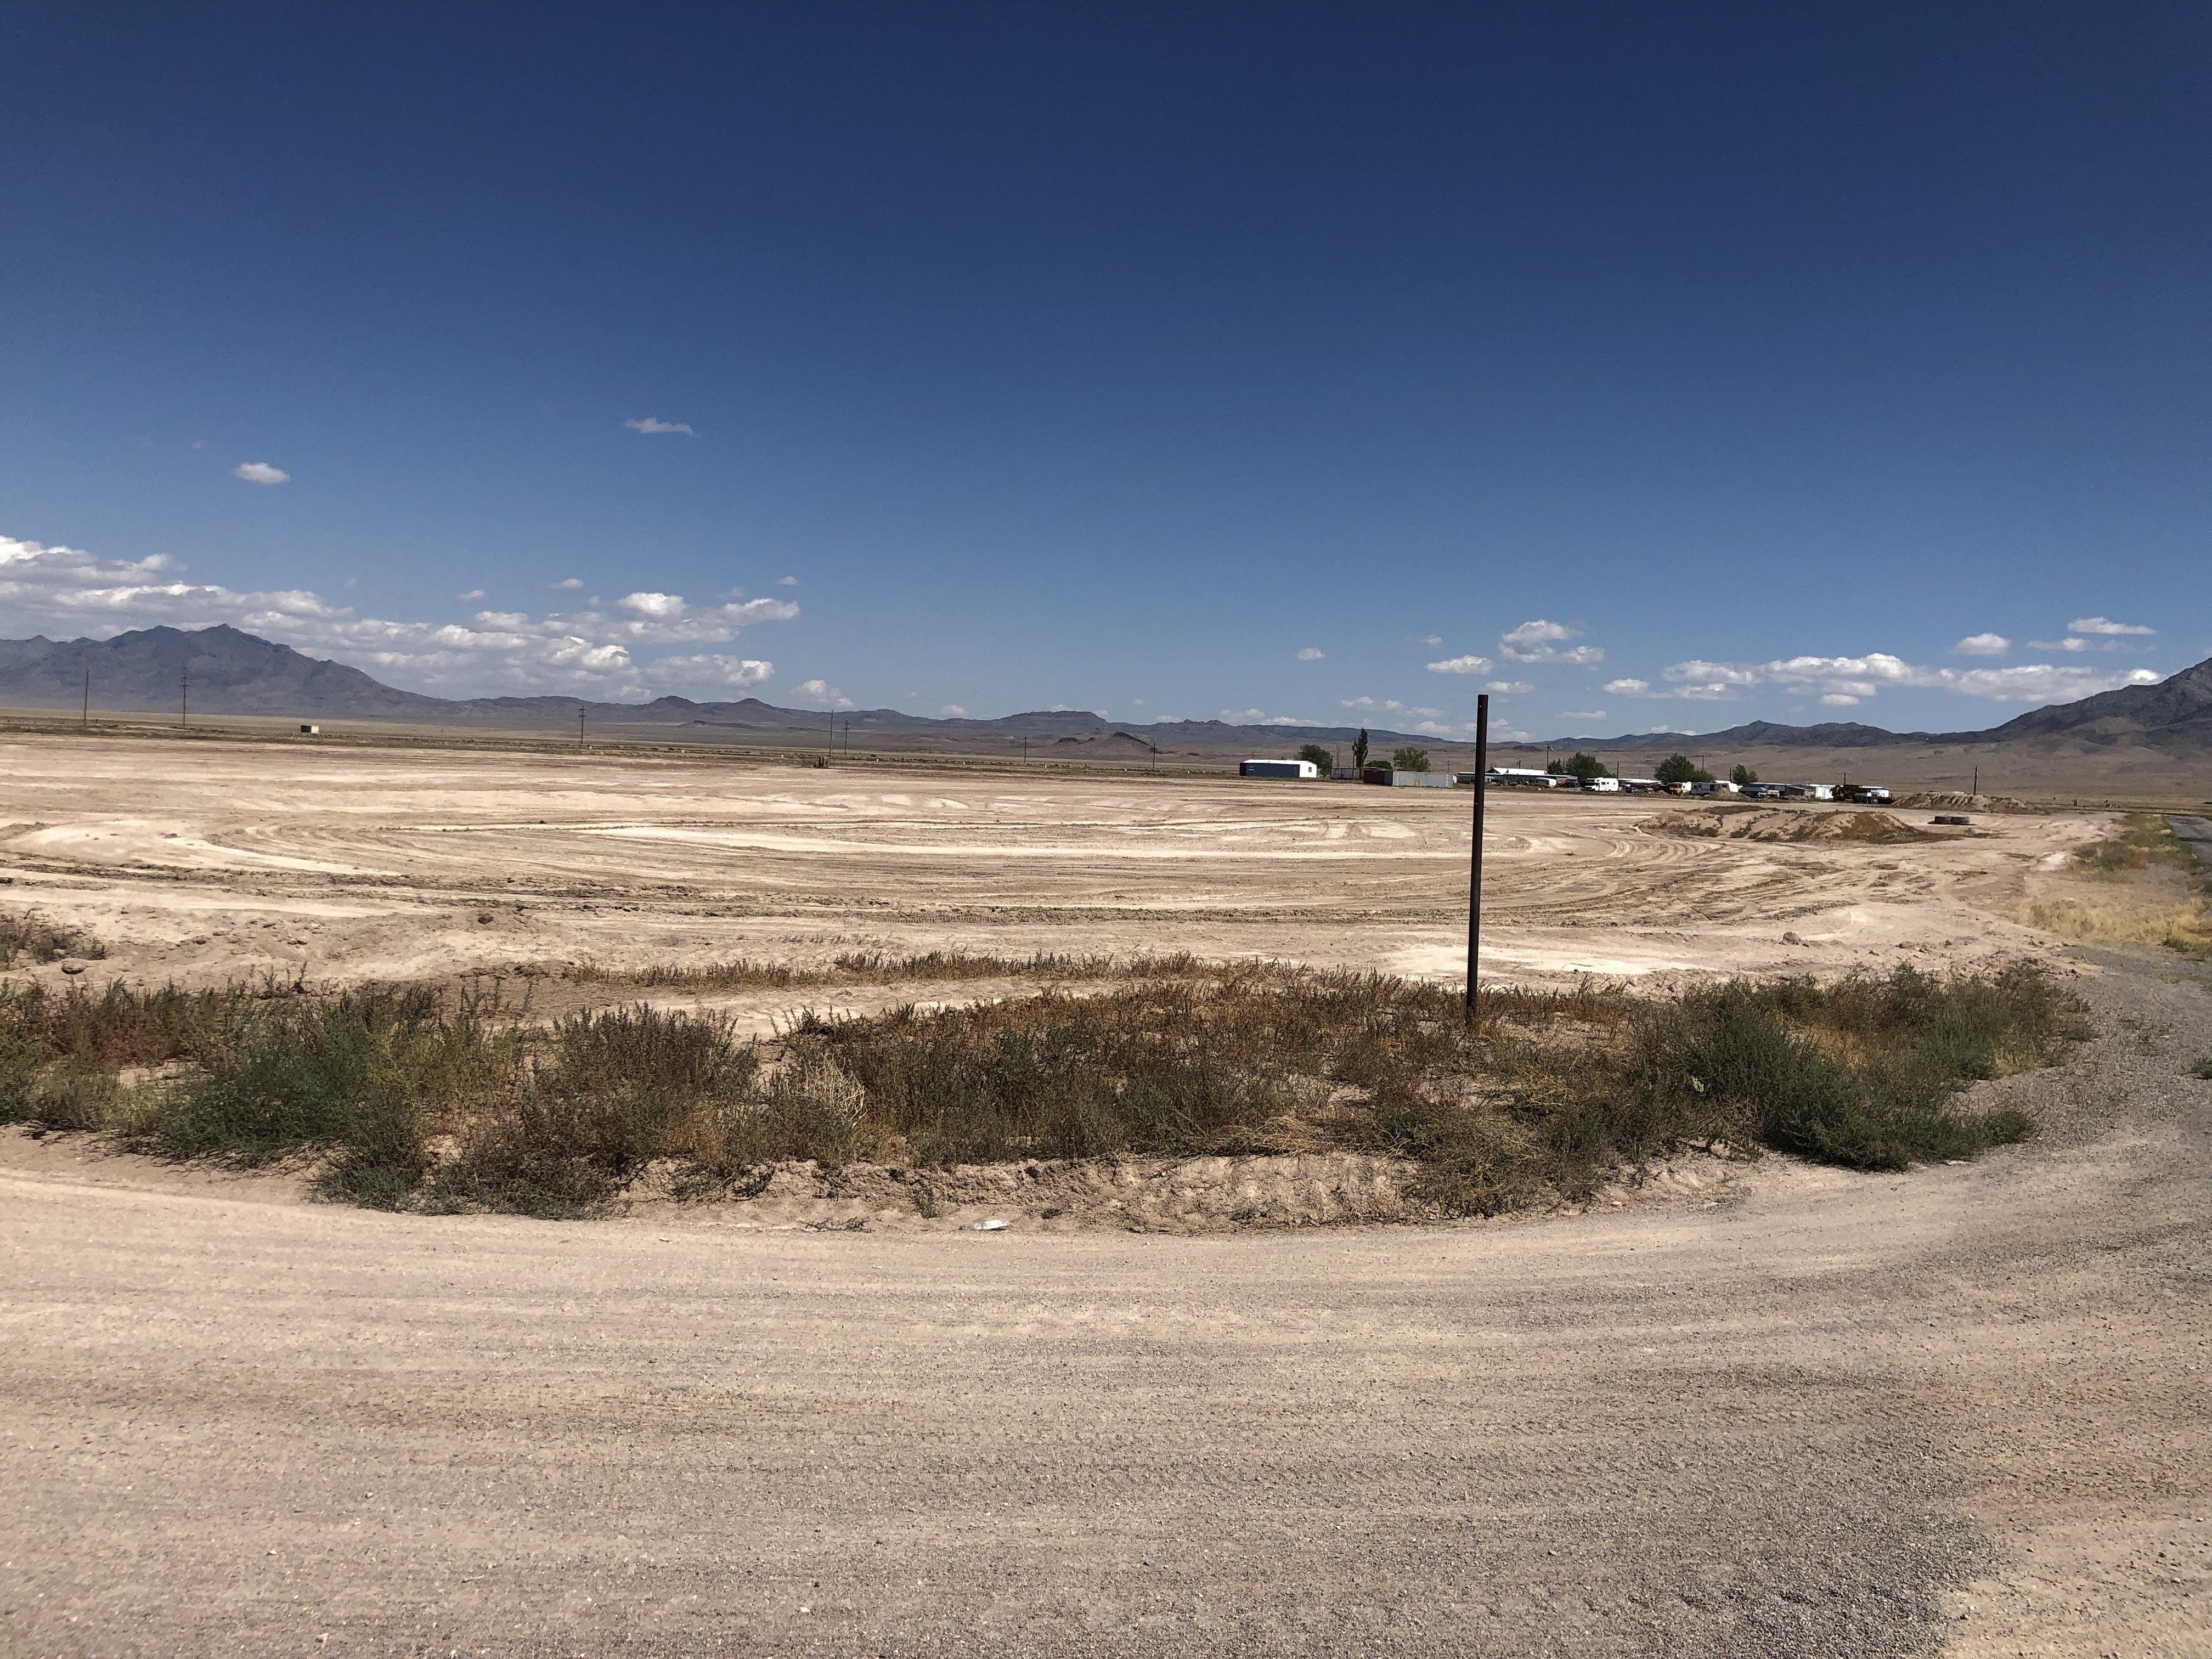 The site of Alienstock in Rachel, Nevada, on Wednesday, Sept. 11.